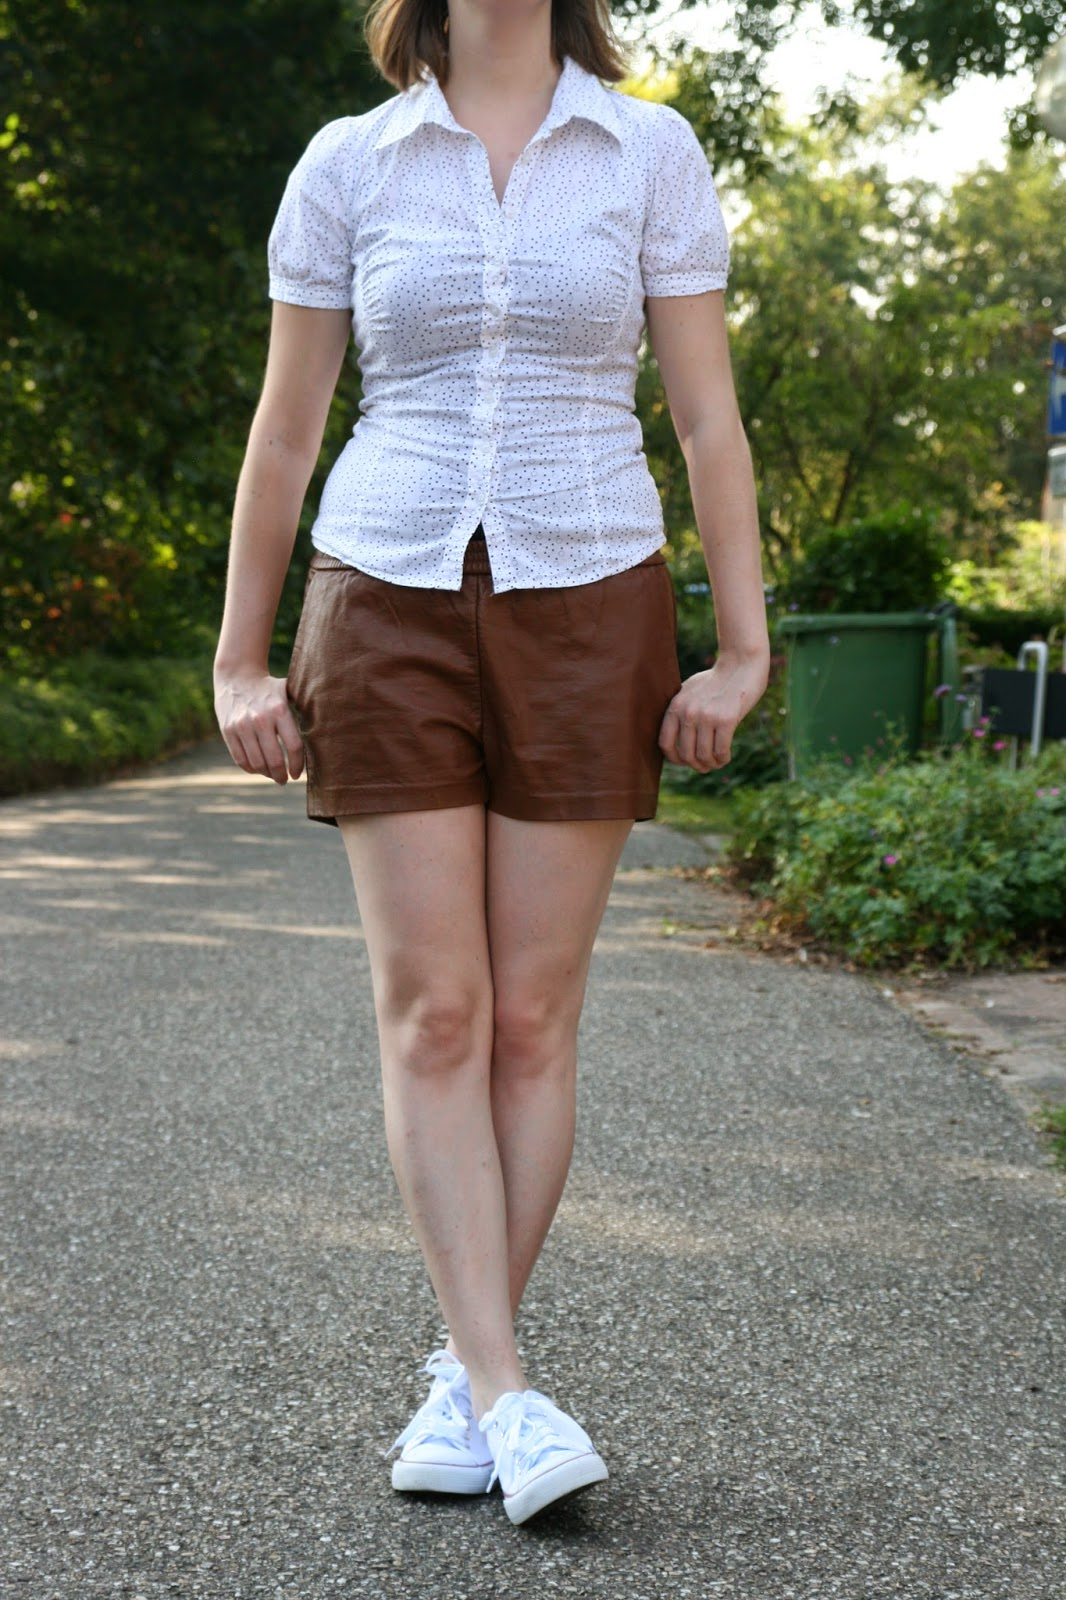 http://hmlovur.blogspot.nl/2014/09/outfits-of-week-week-38.html